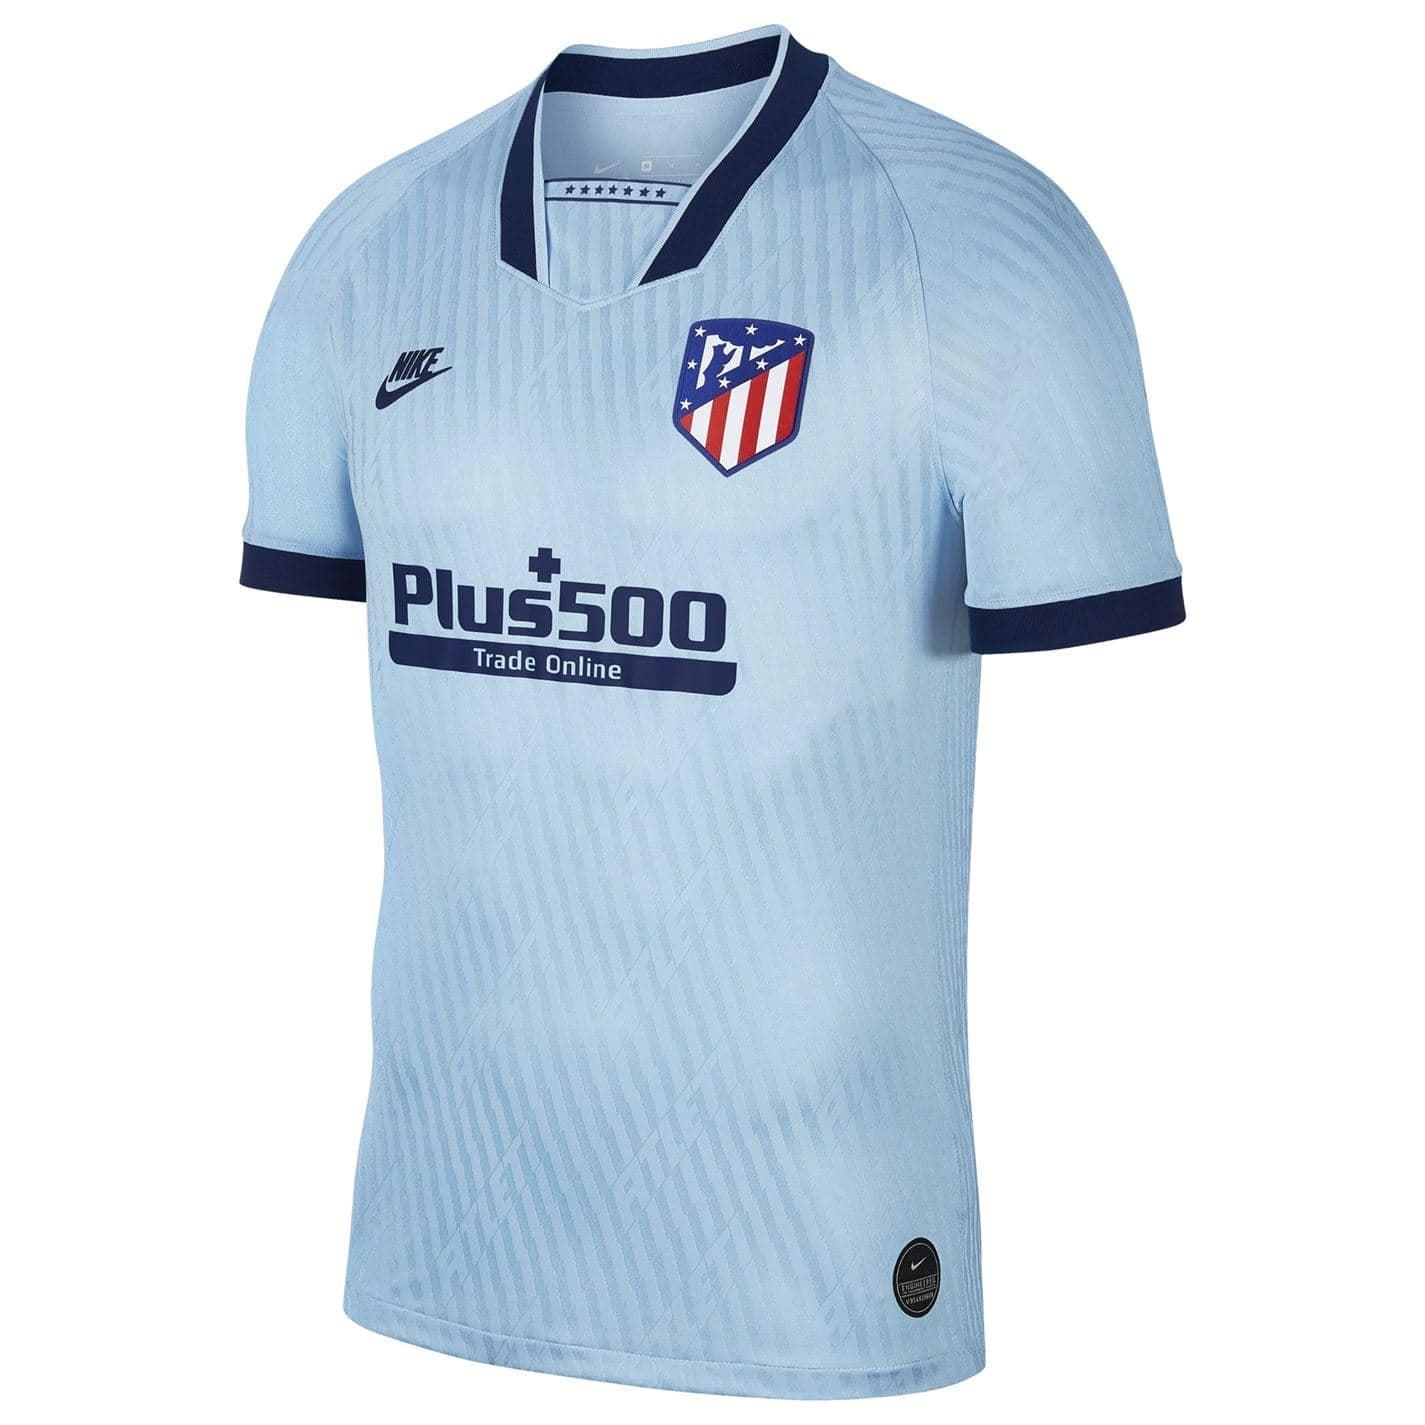 Detalles de Nike Atlético de Madrid Tercera Camisa 2019 2020 Hombres Azul Fútbol Camiseta